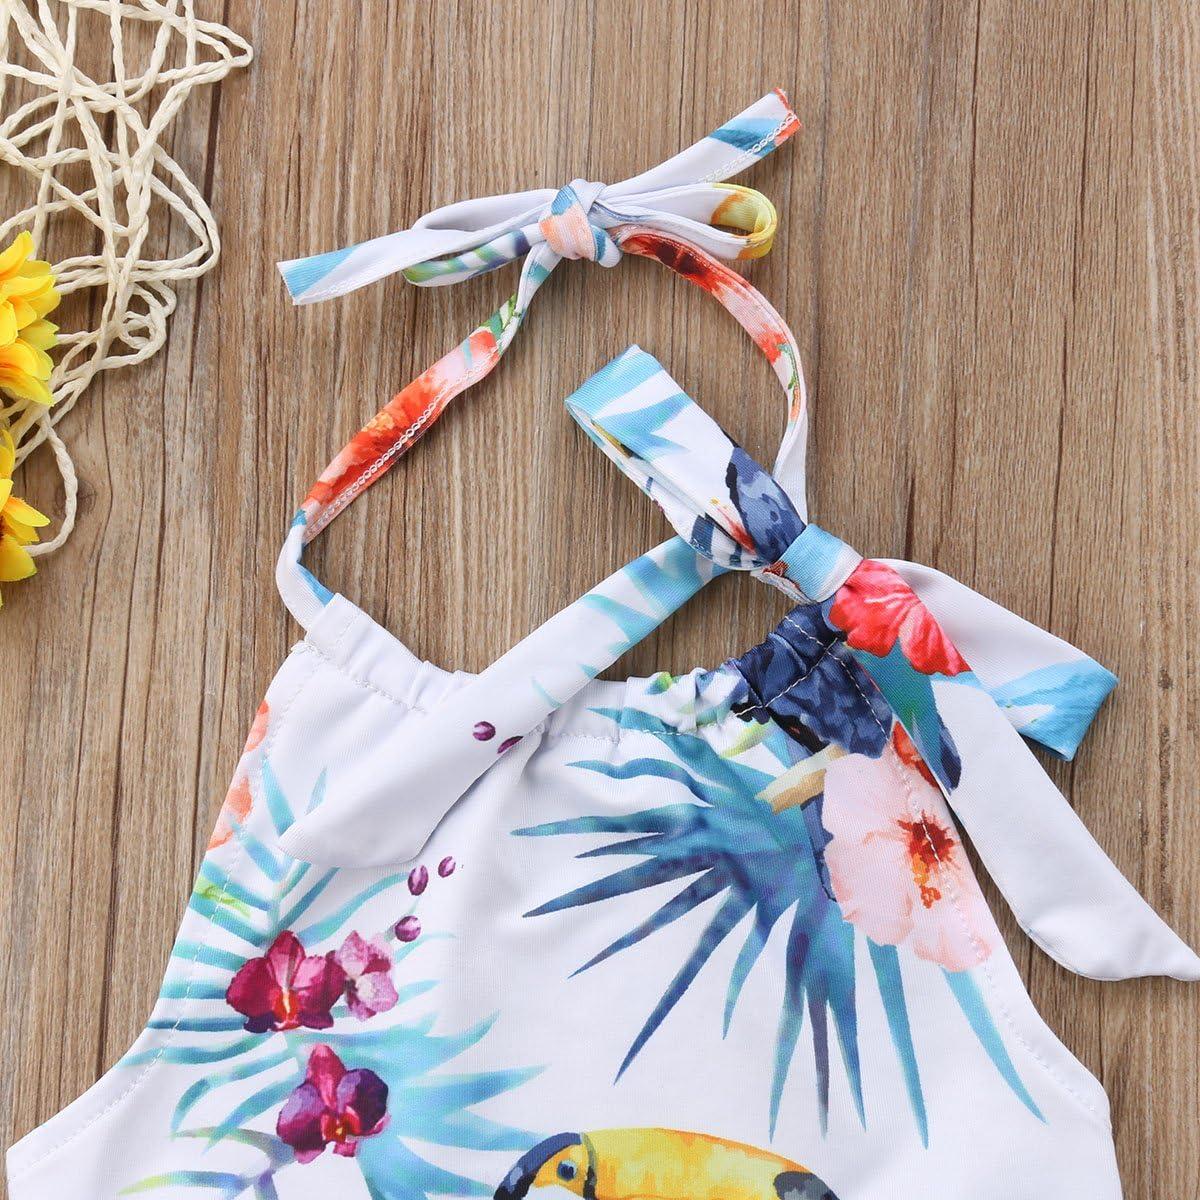 Andannby Kids Toddler Girl Flower Birds Printed Halter One-Piece Swimsuit Swimwear